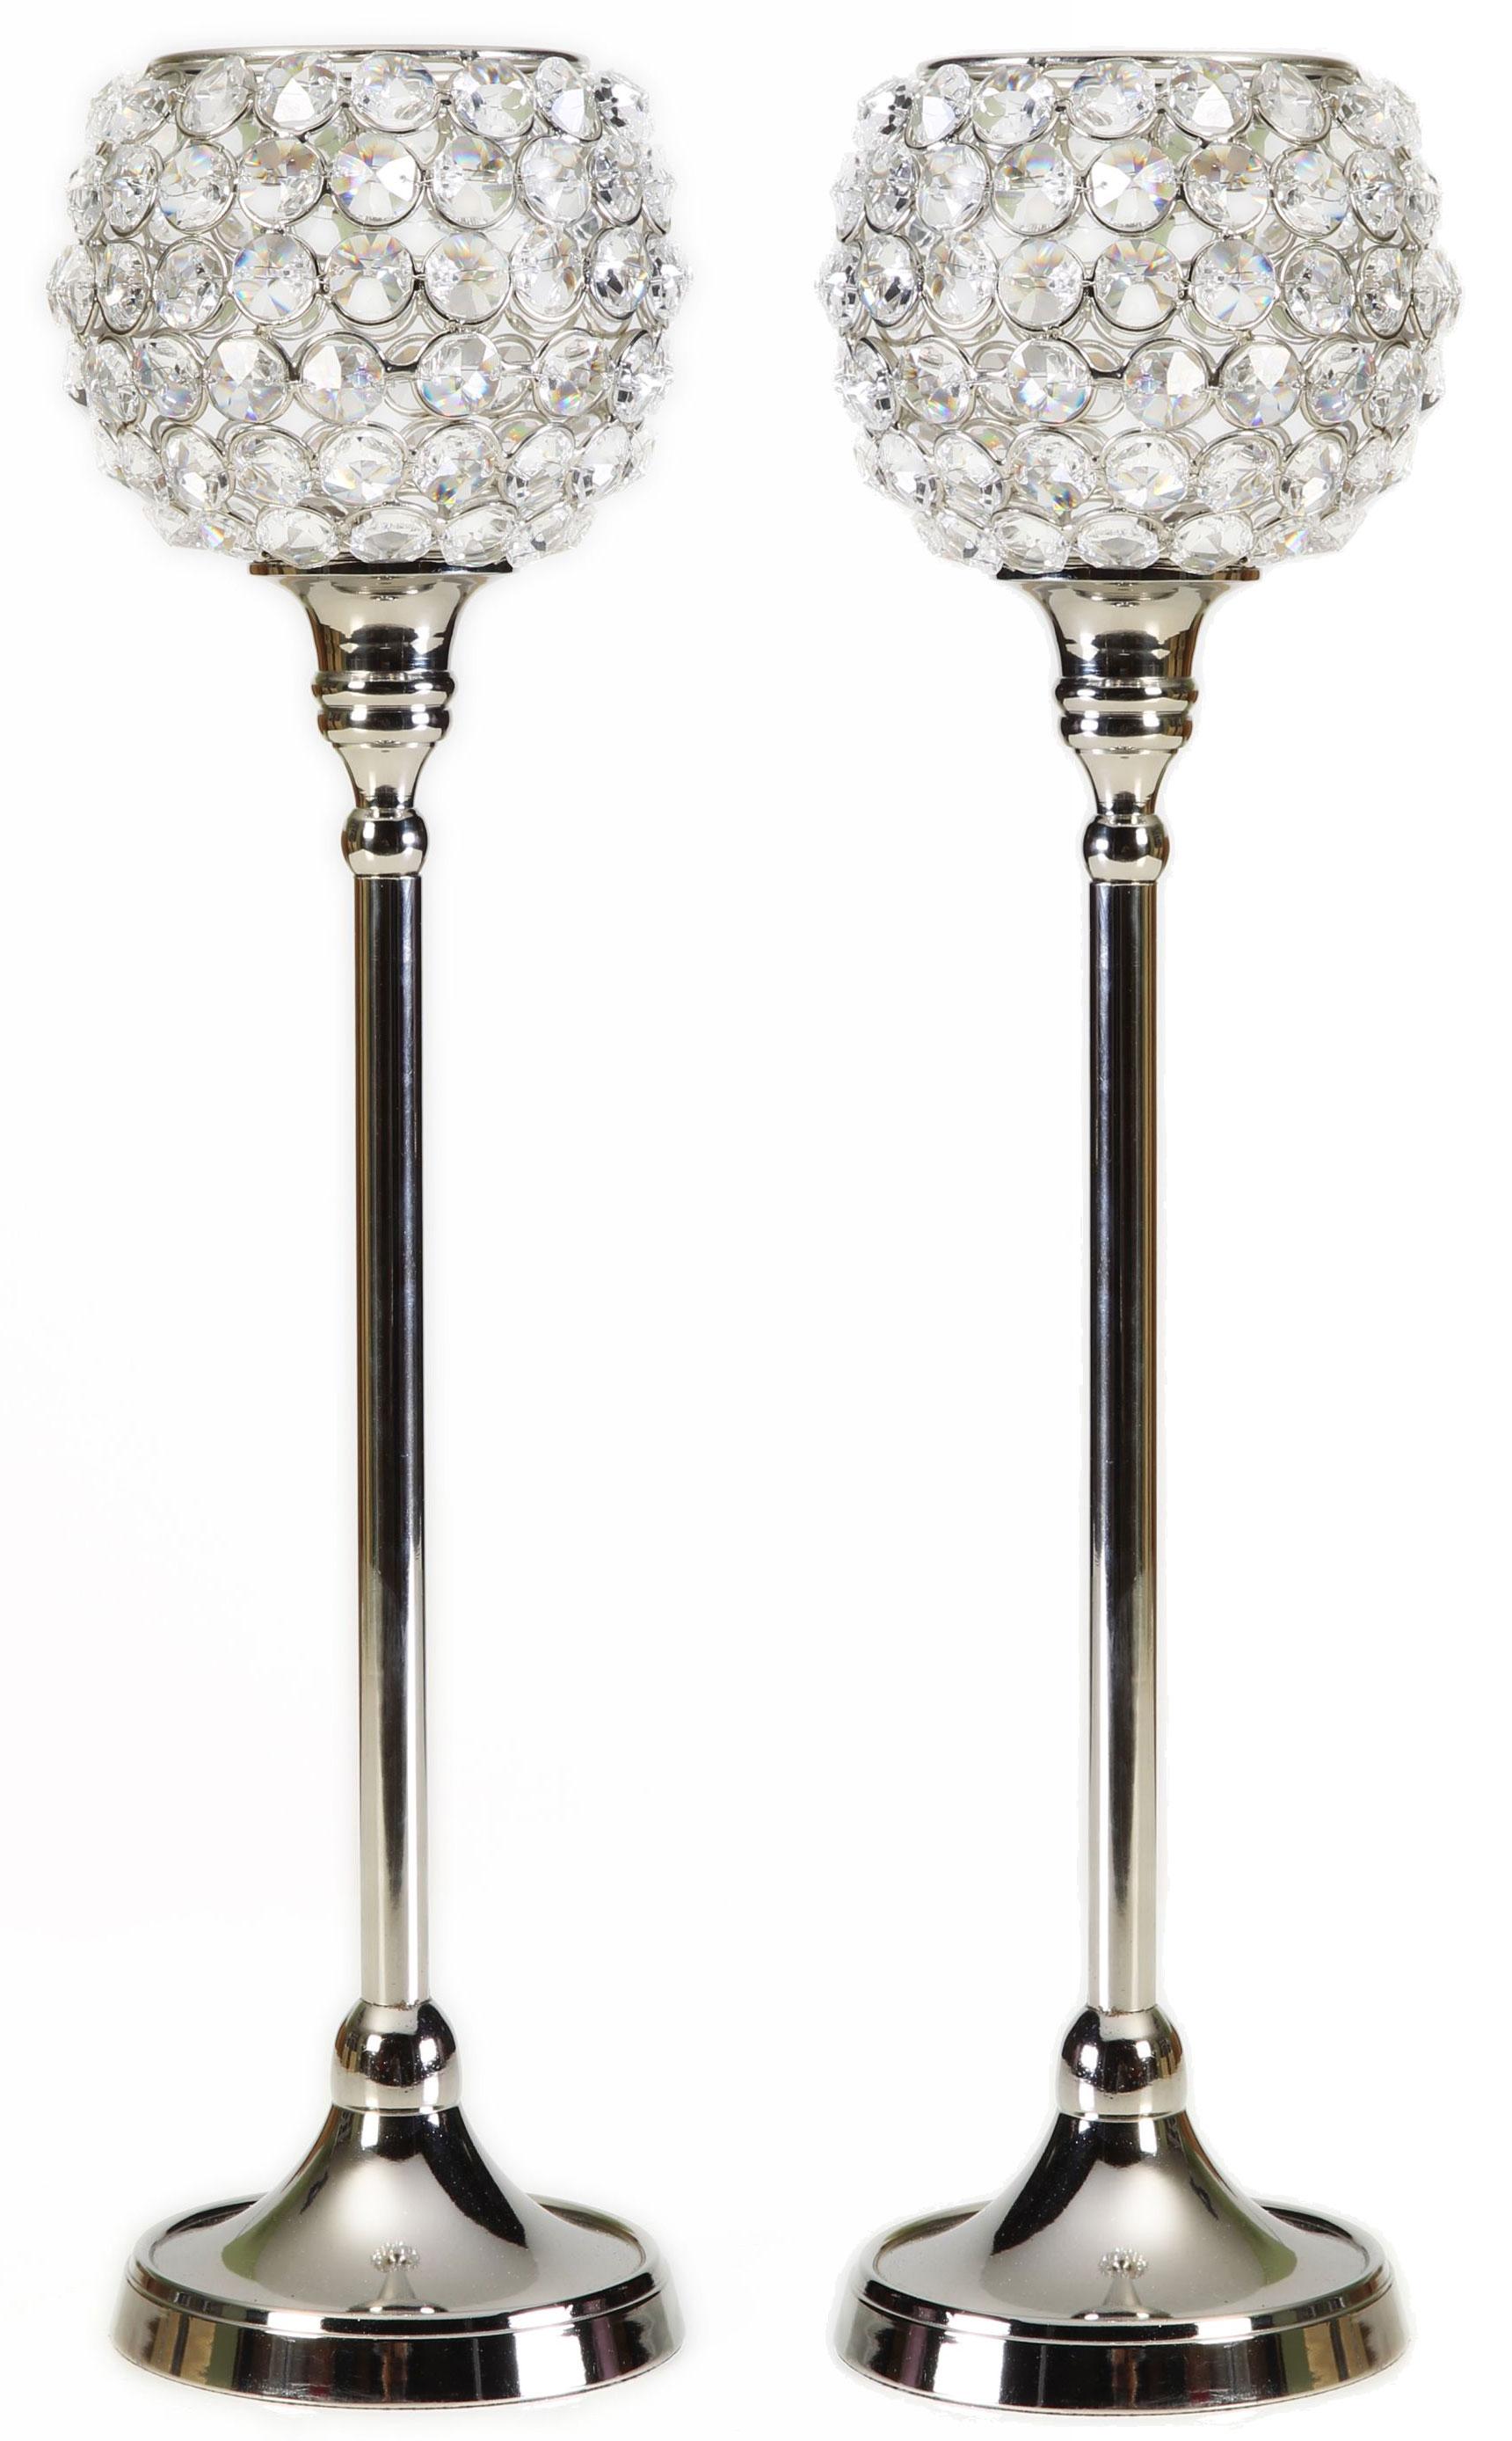 Kristall Kerzenständer Marie M 2er Set Teelichthalter Kerzenhalter